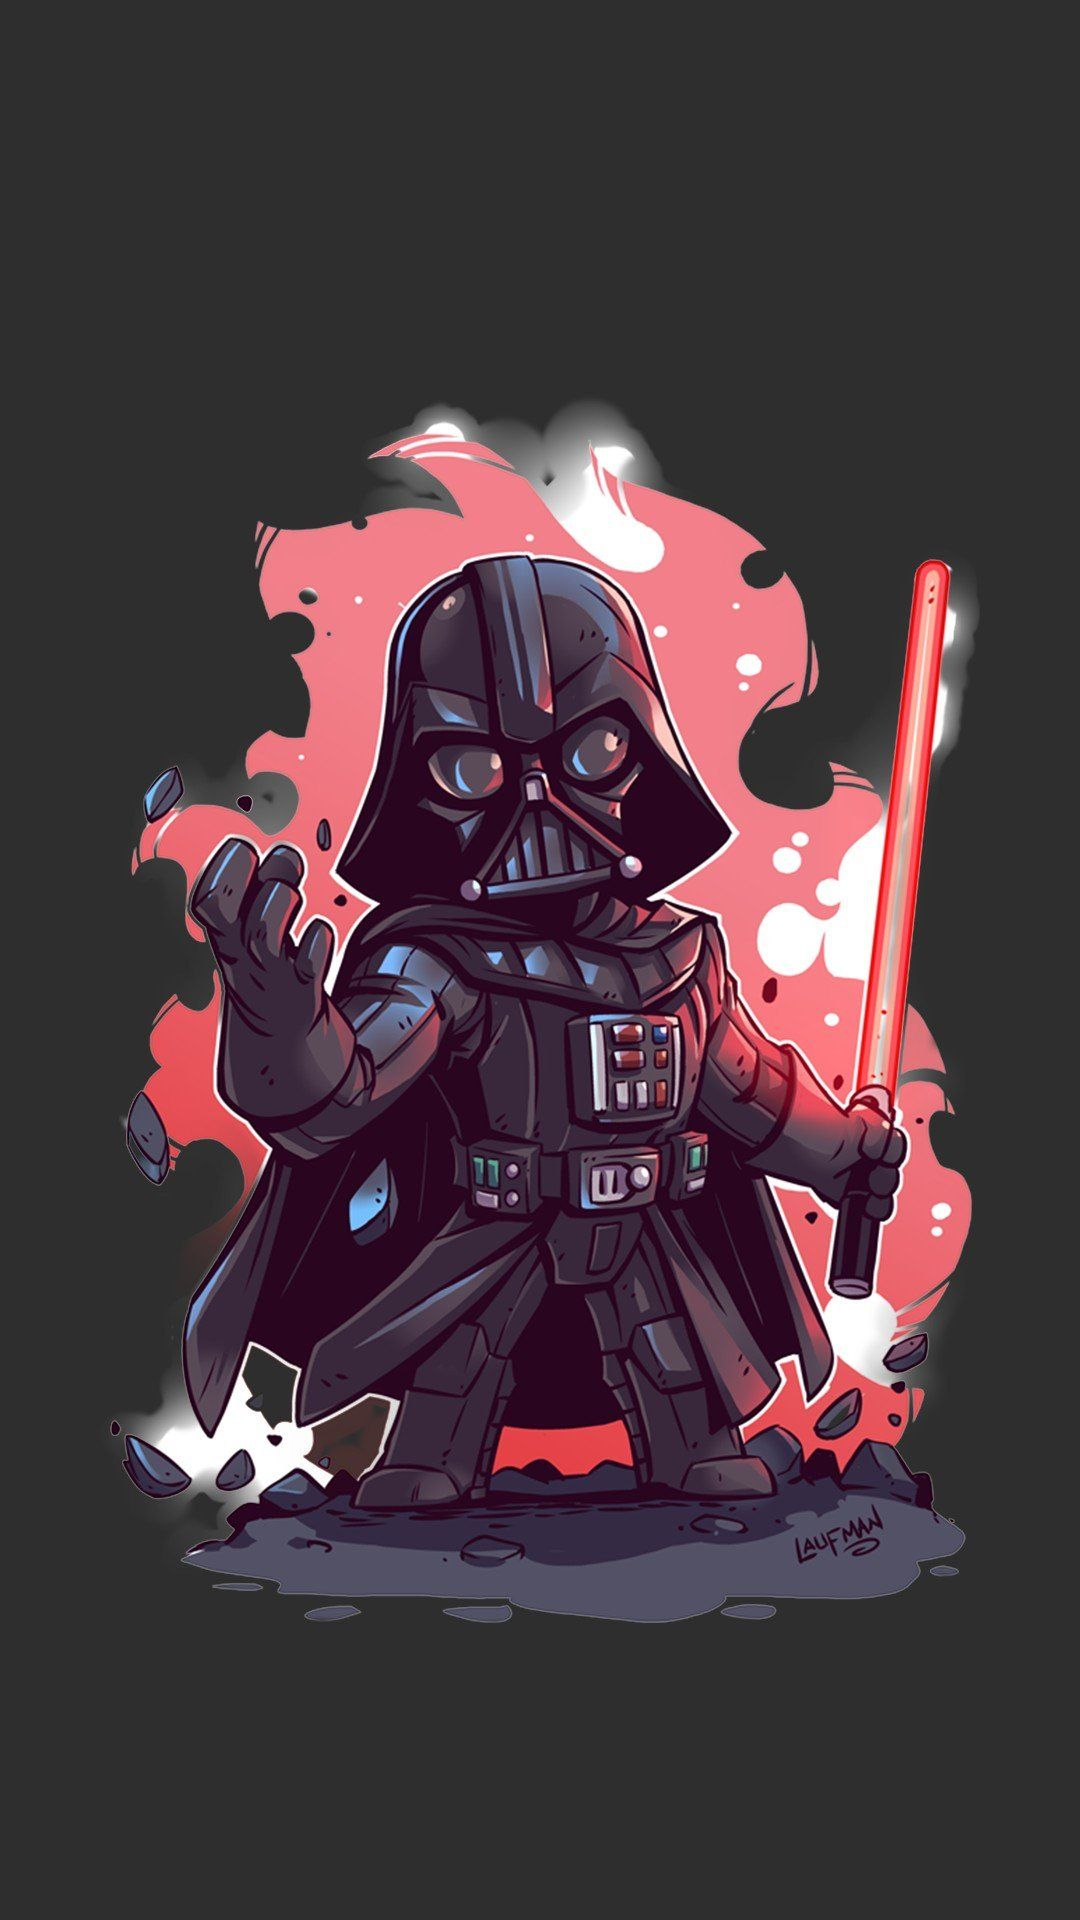 Minimalist Darth Vader Photo In 2020 Star Wars Cartoon Star Wars Wallpaper Star Wars Drawings